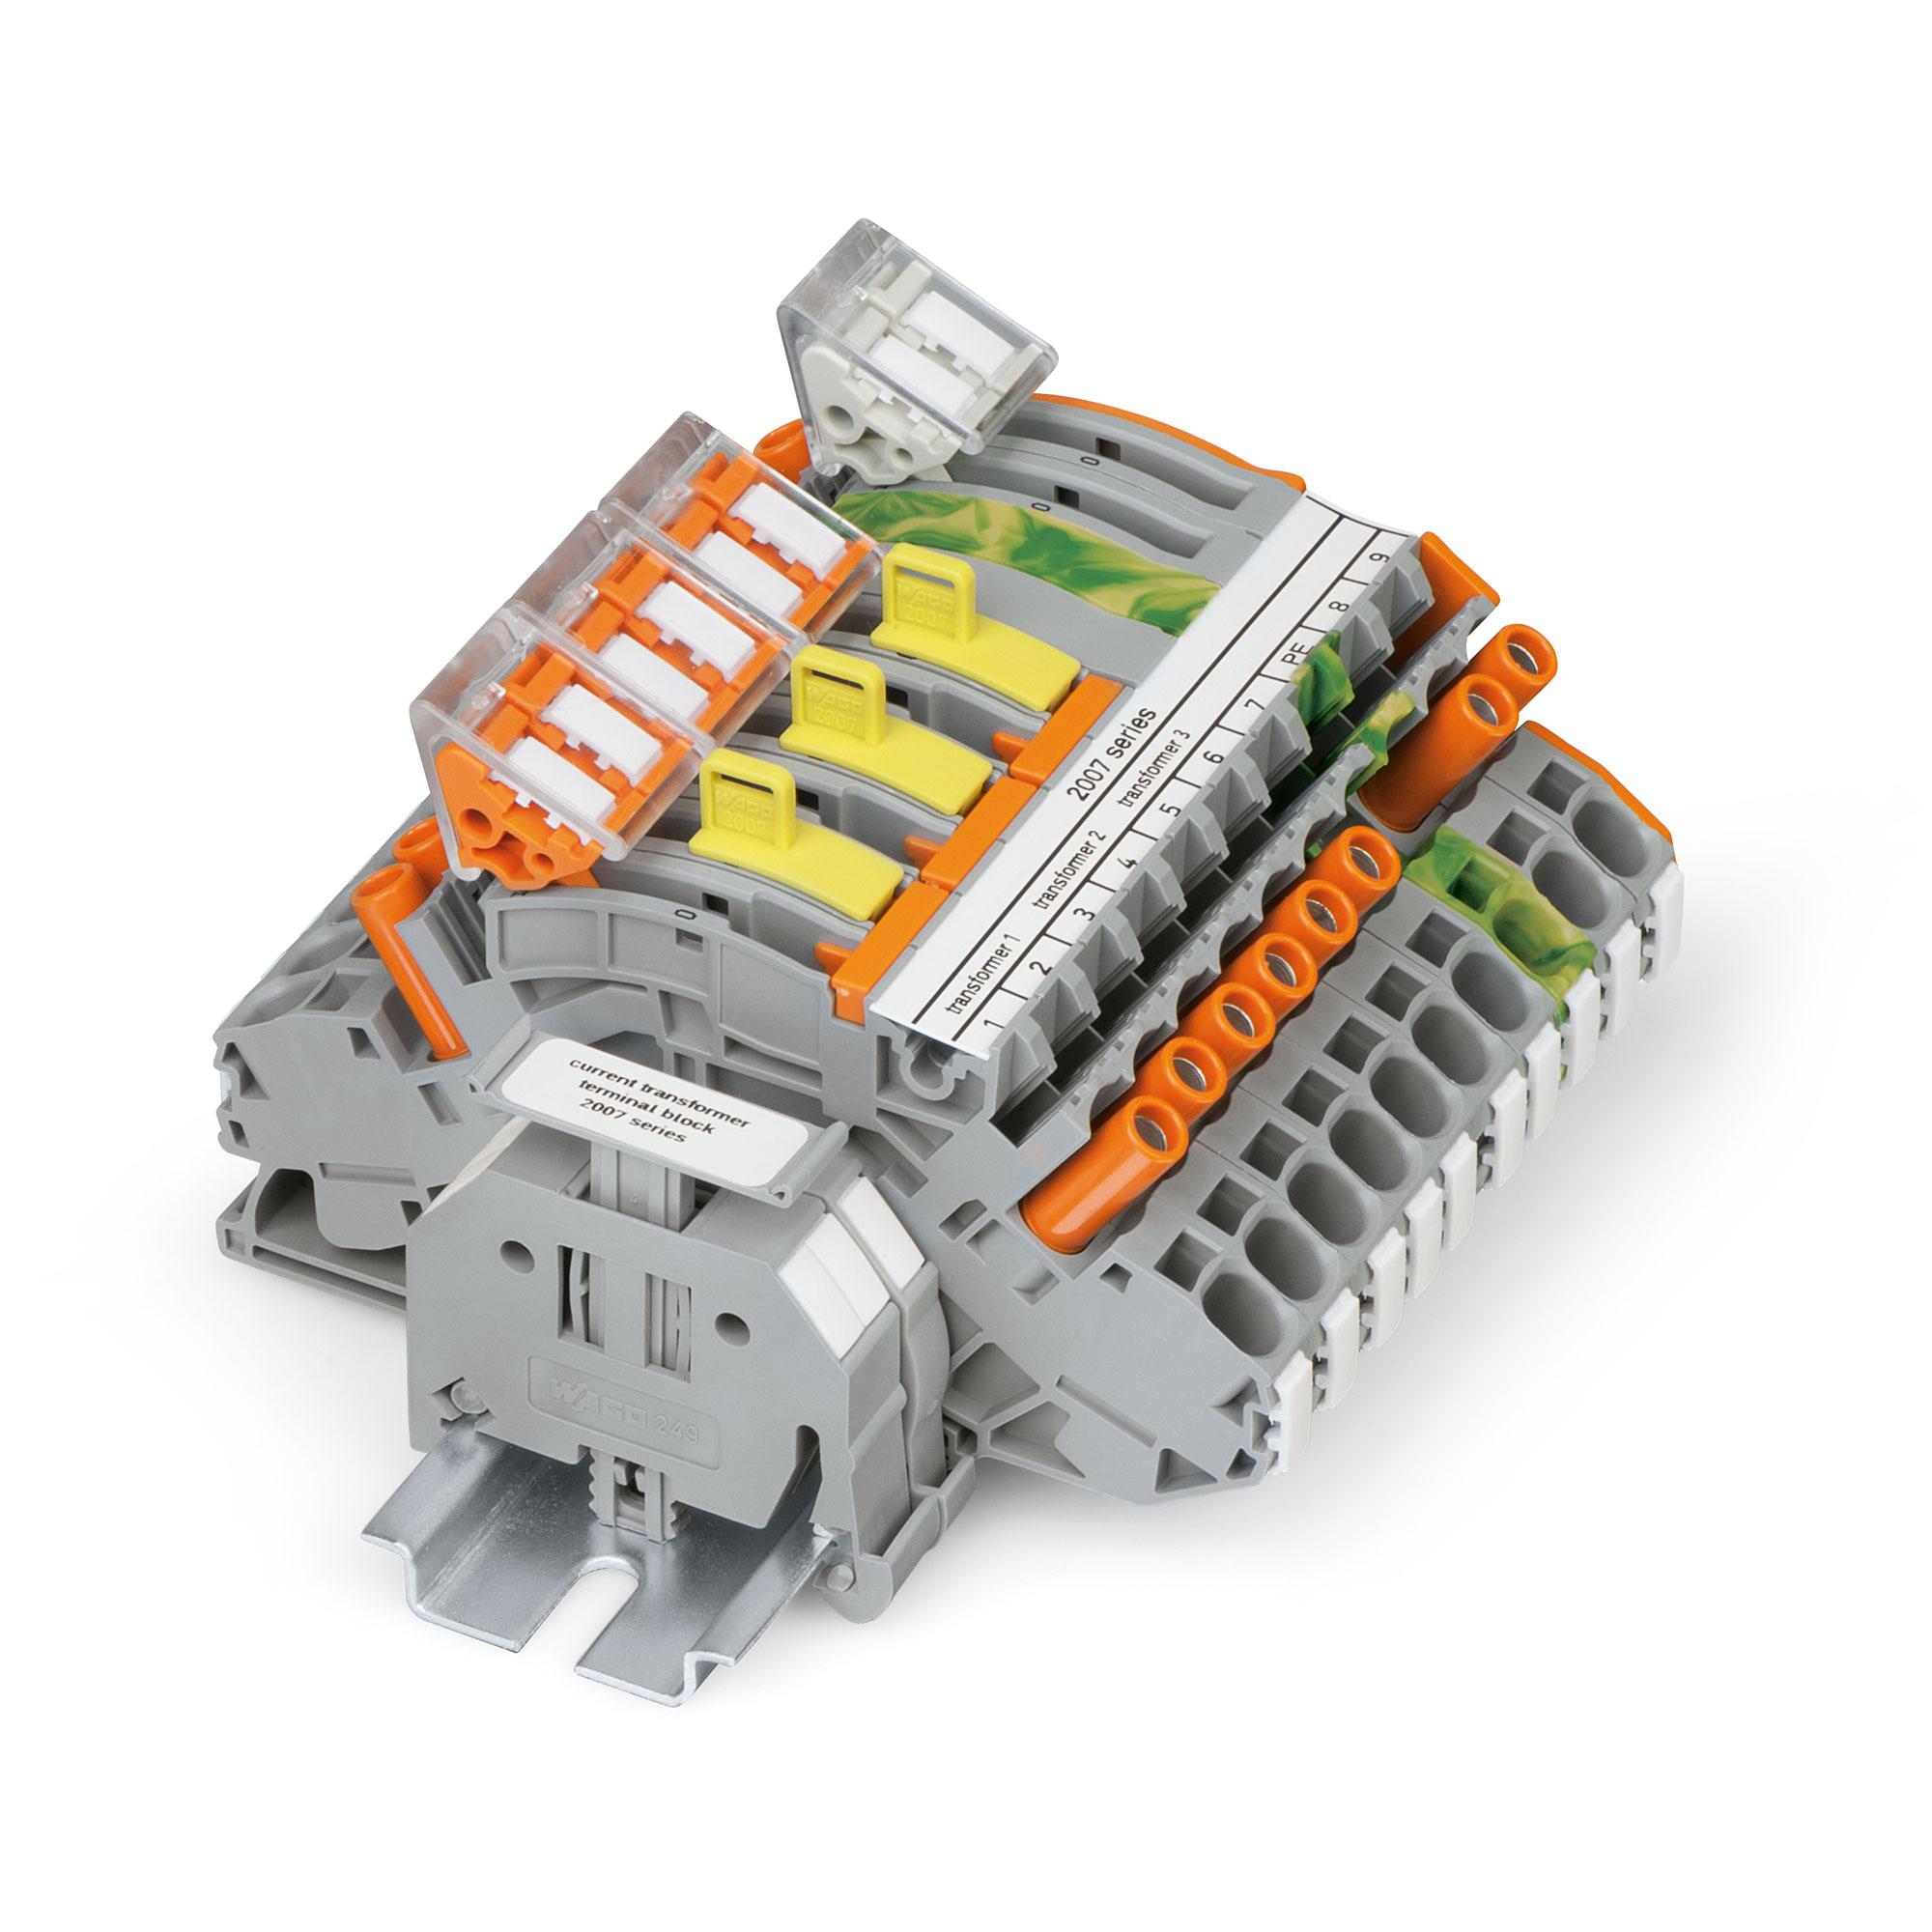 Wago Topjob S Rail Mount Terminal Blocks Fuse Box Single Push Current And Voltage Transformer